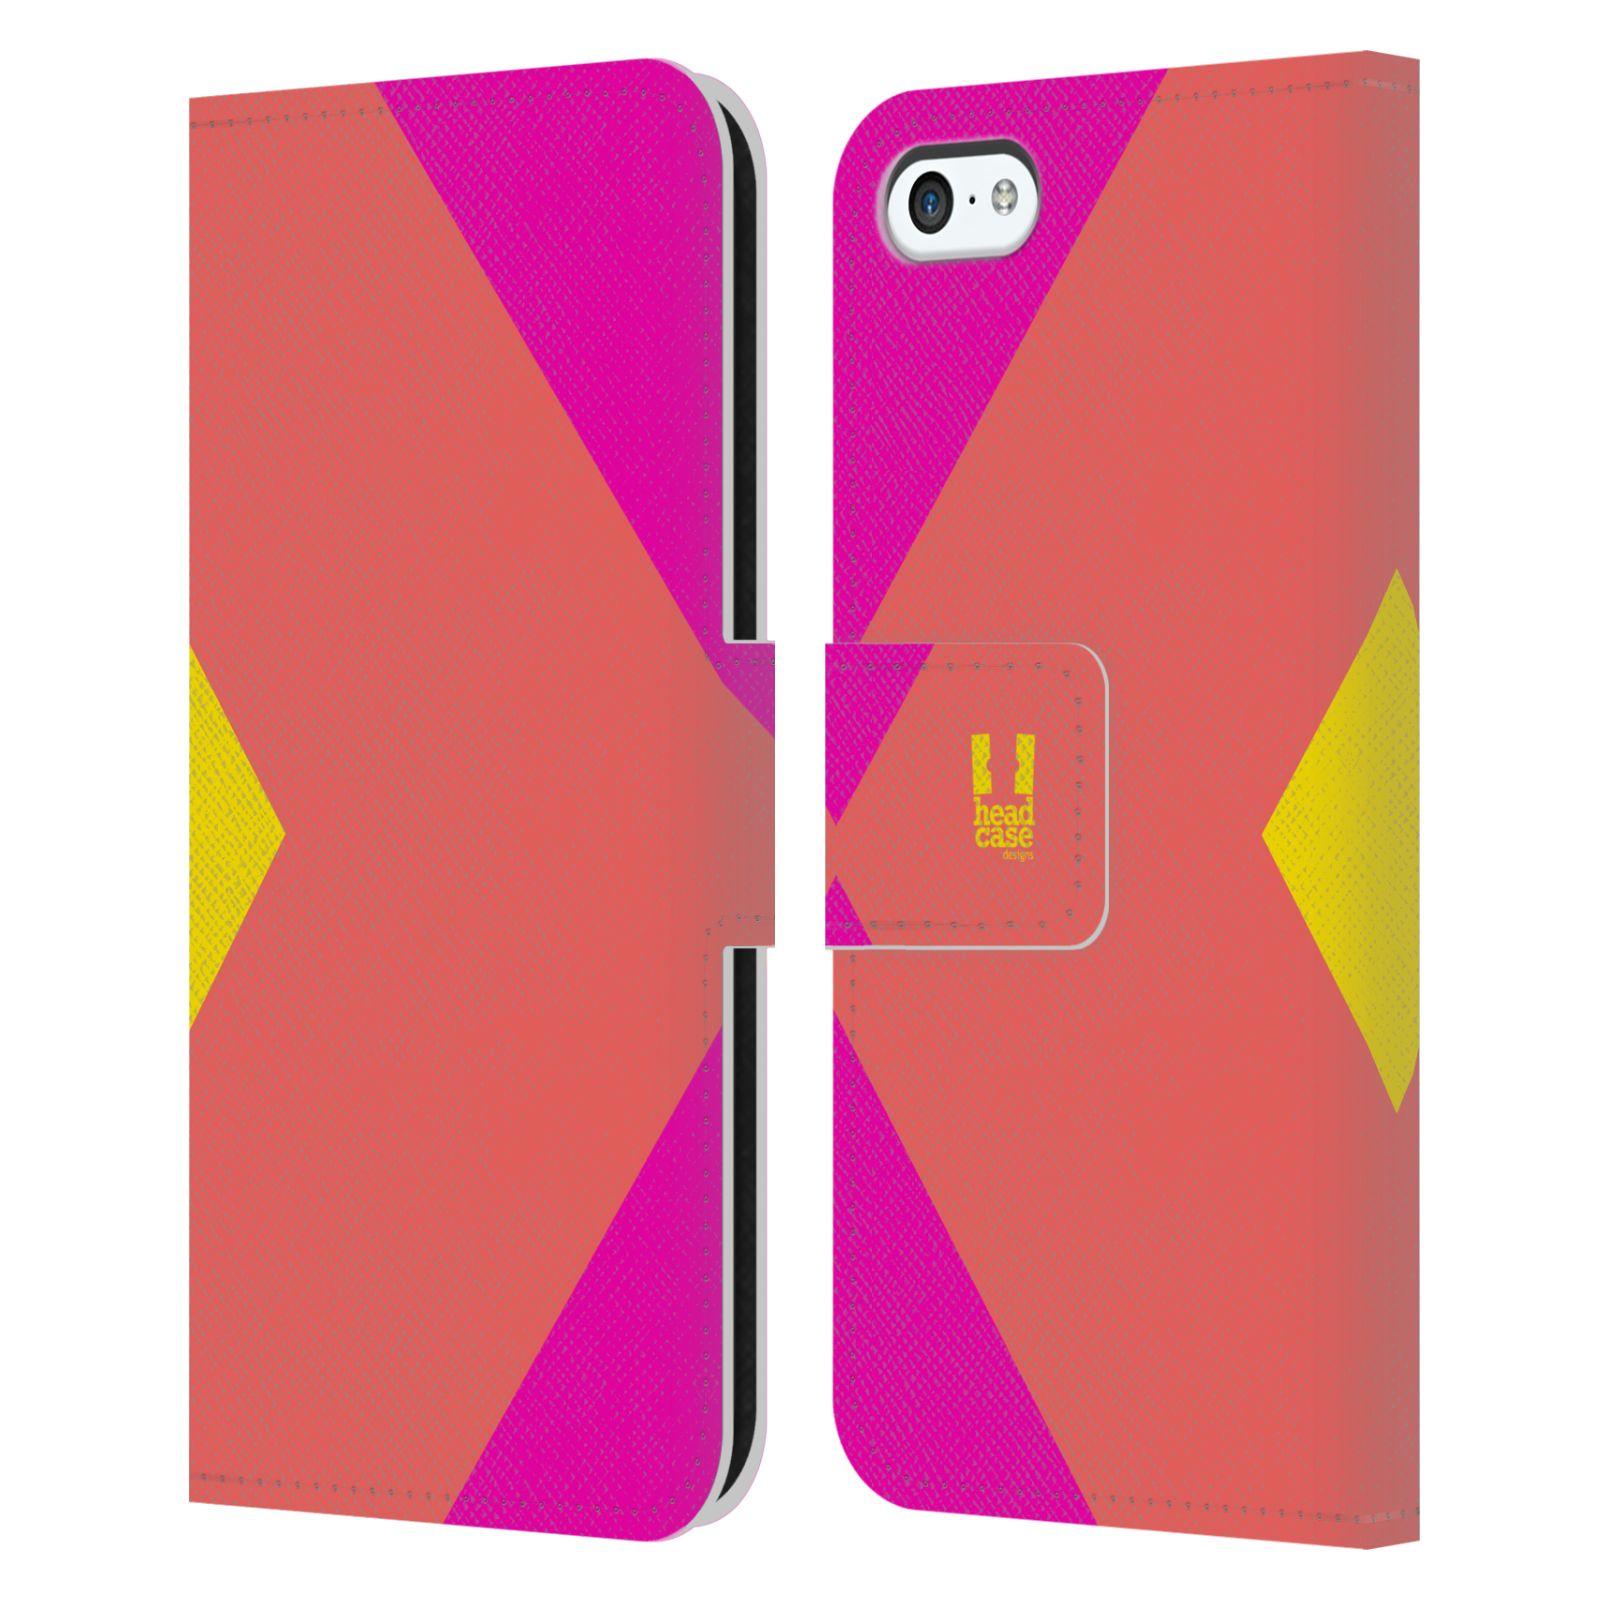 HEAD CASE Flipové pouzdro pro mobil Apple Iphone 5C barevné tvary růžová korál